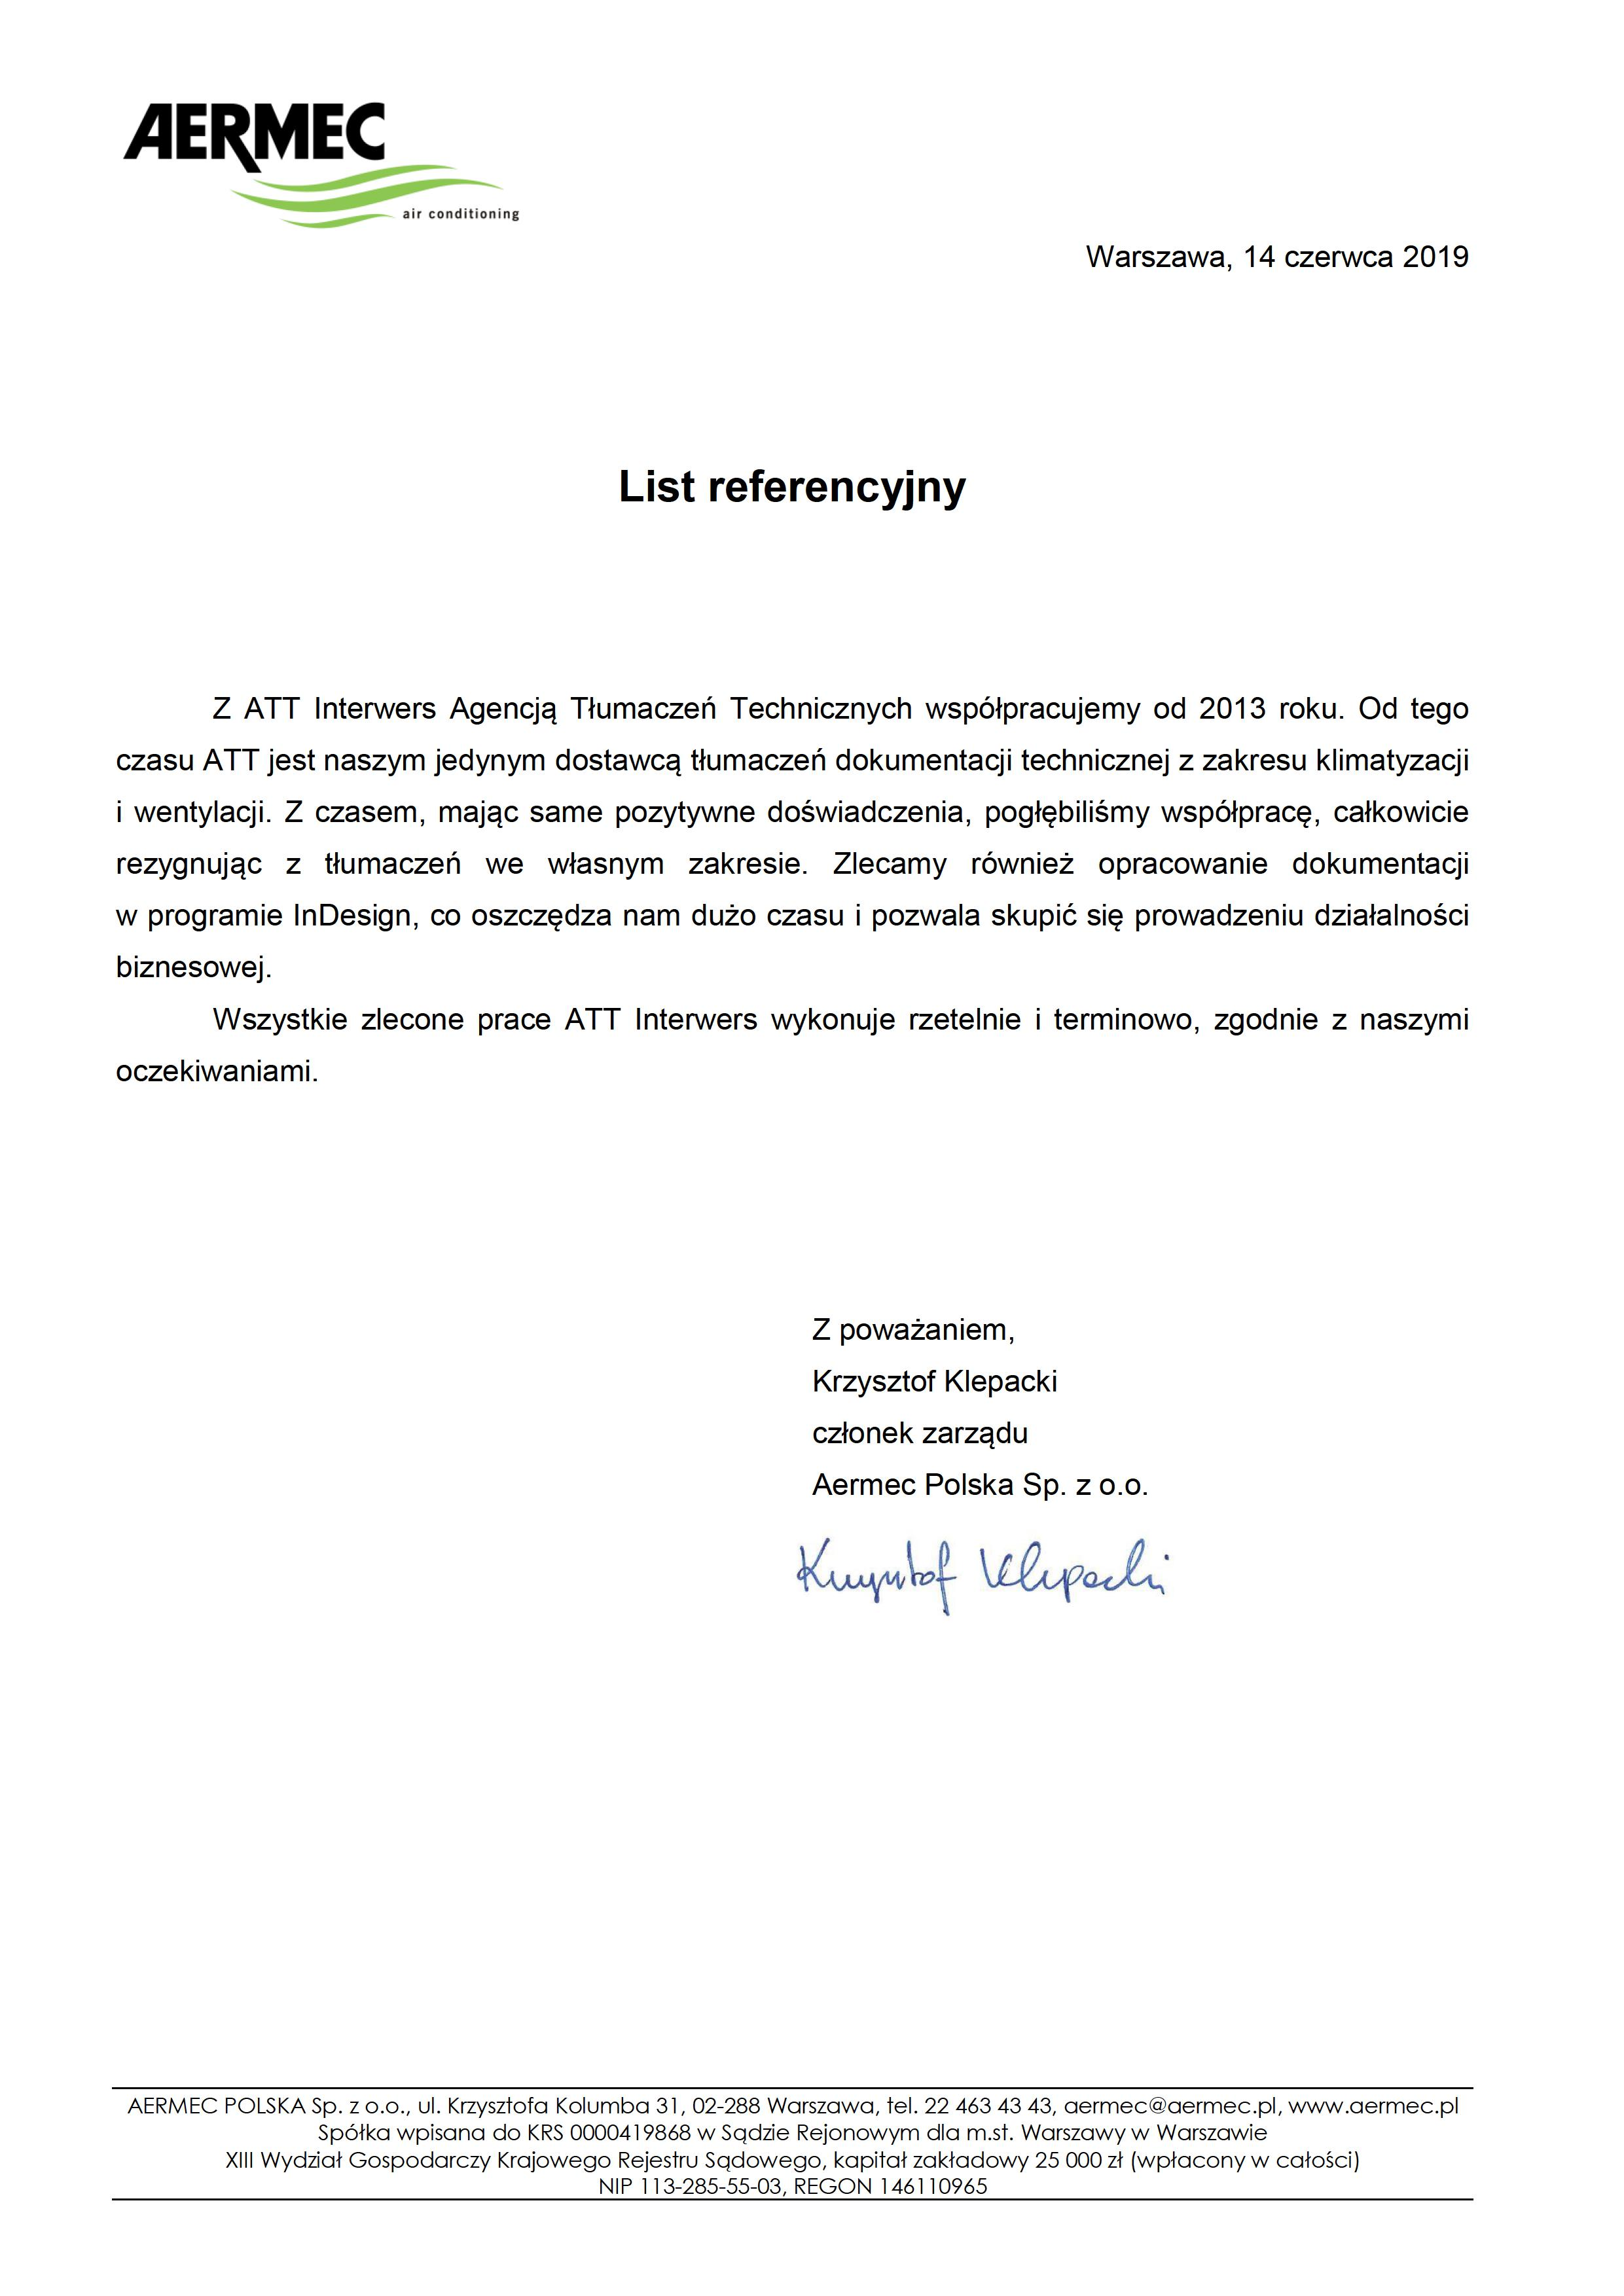 Aermec List referenacyjny